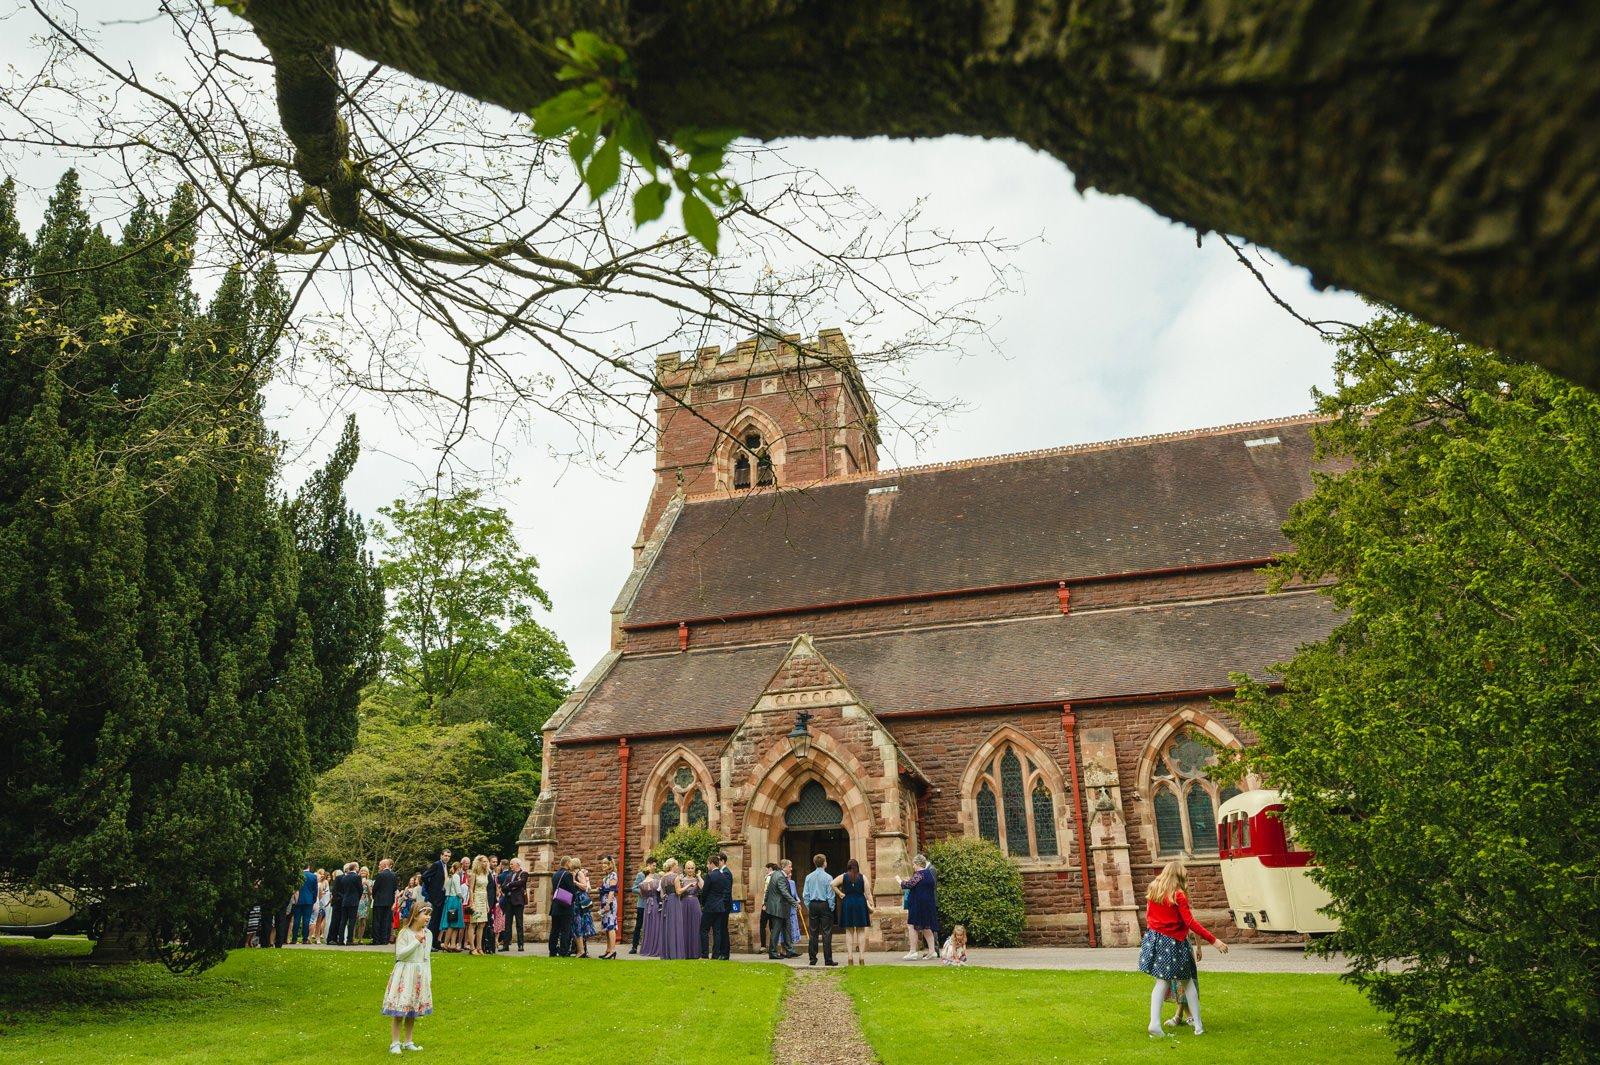 Millers Of Netley wedding, Dorrington, Shrewsbury | Emma + Ben 23